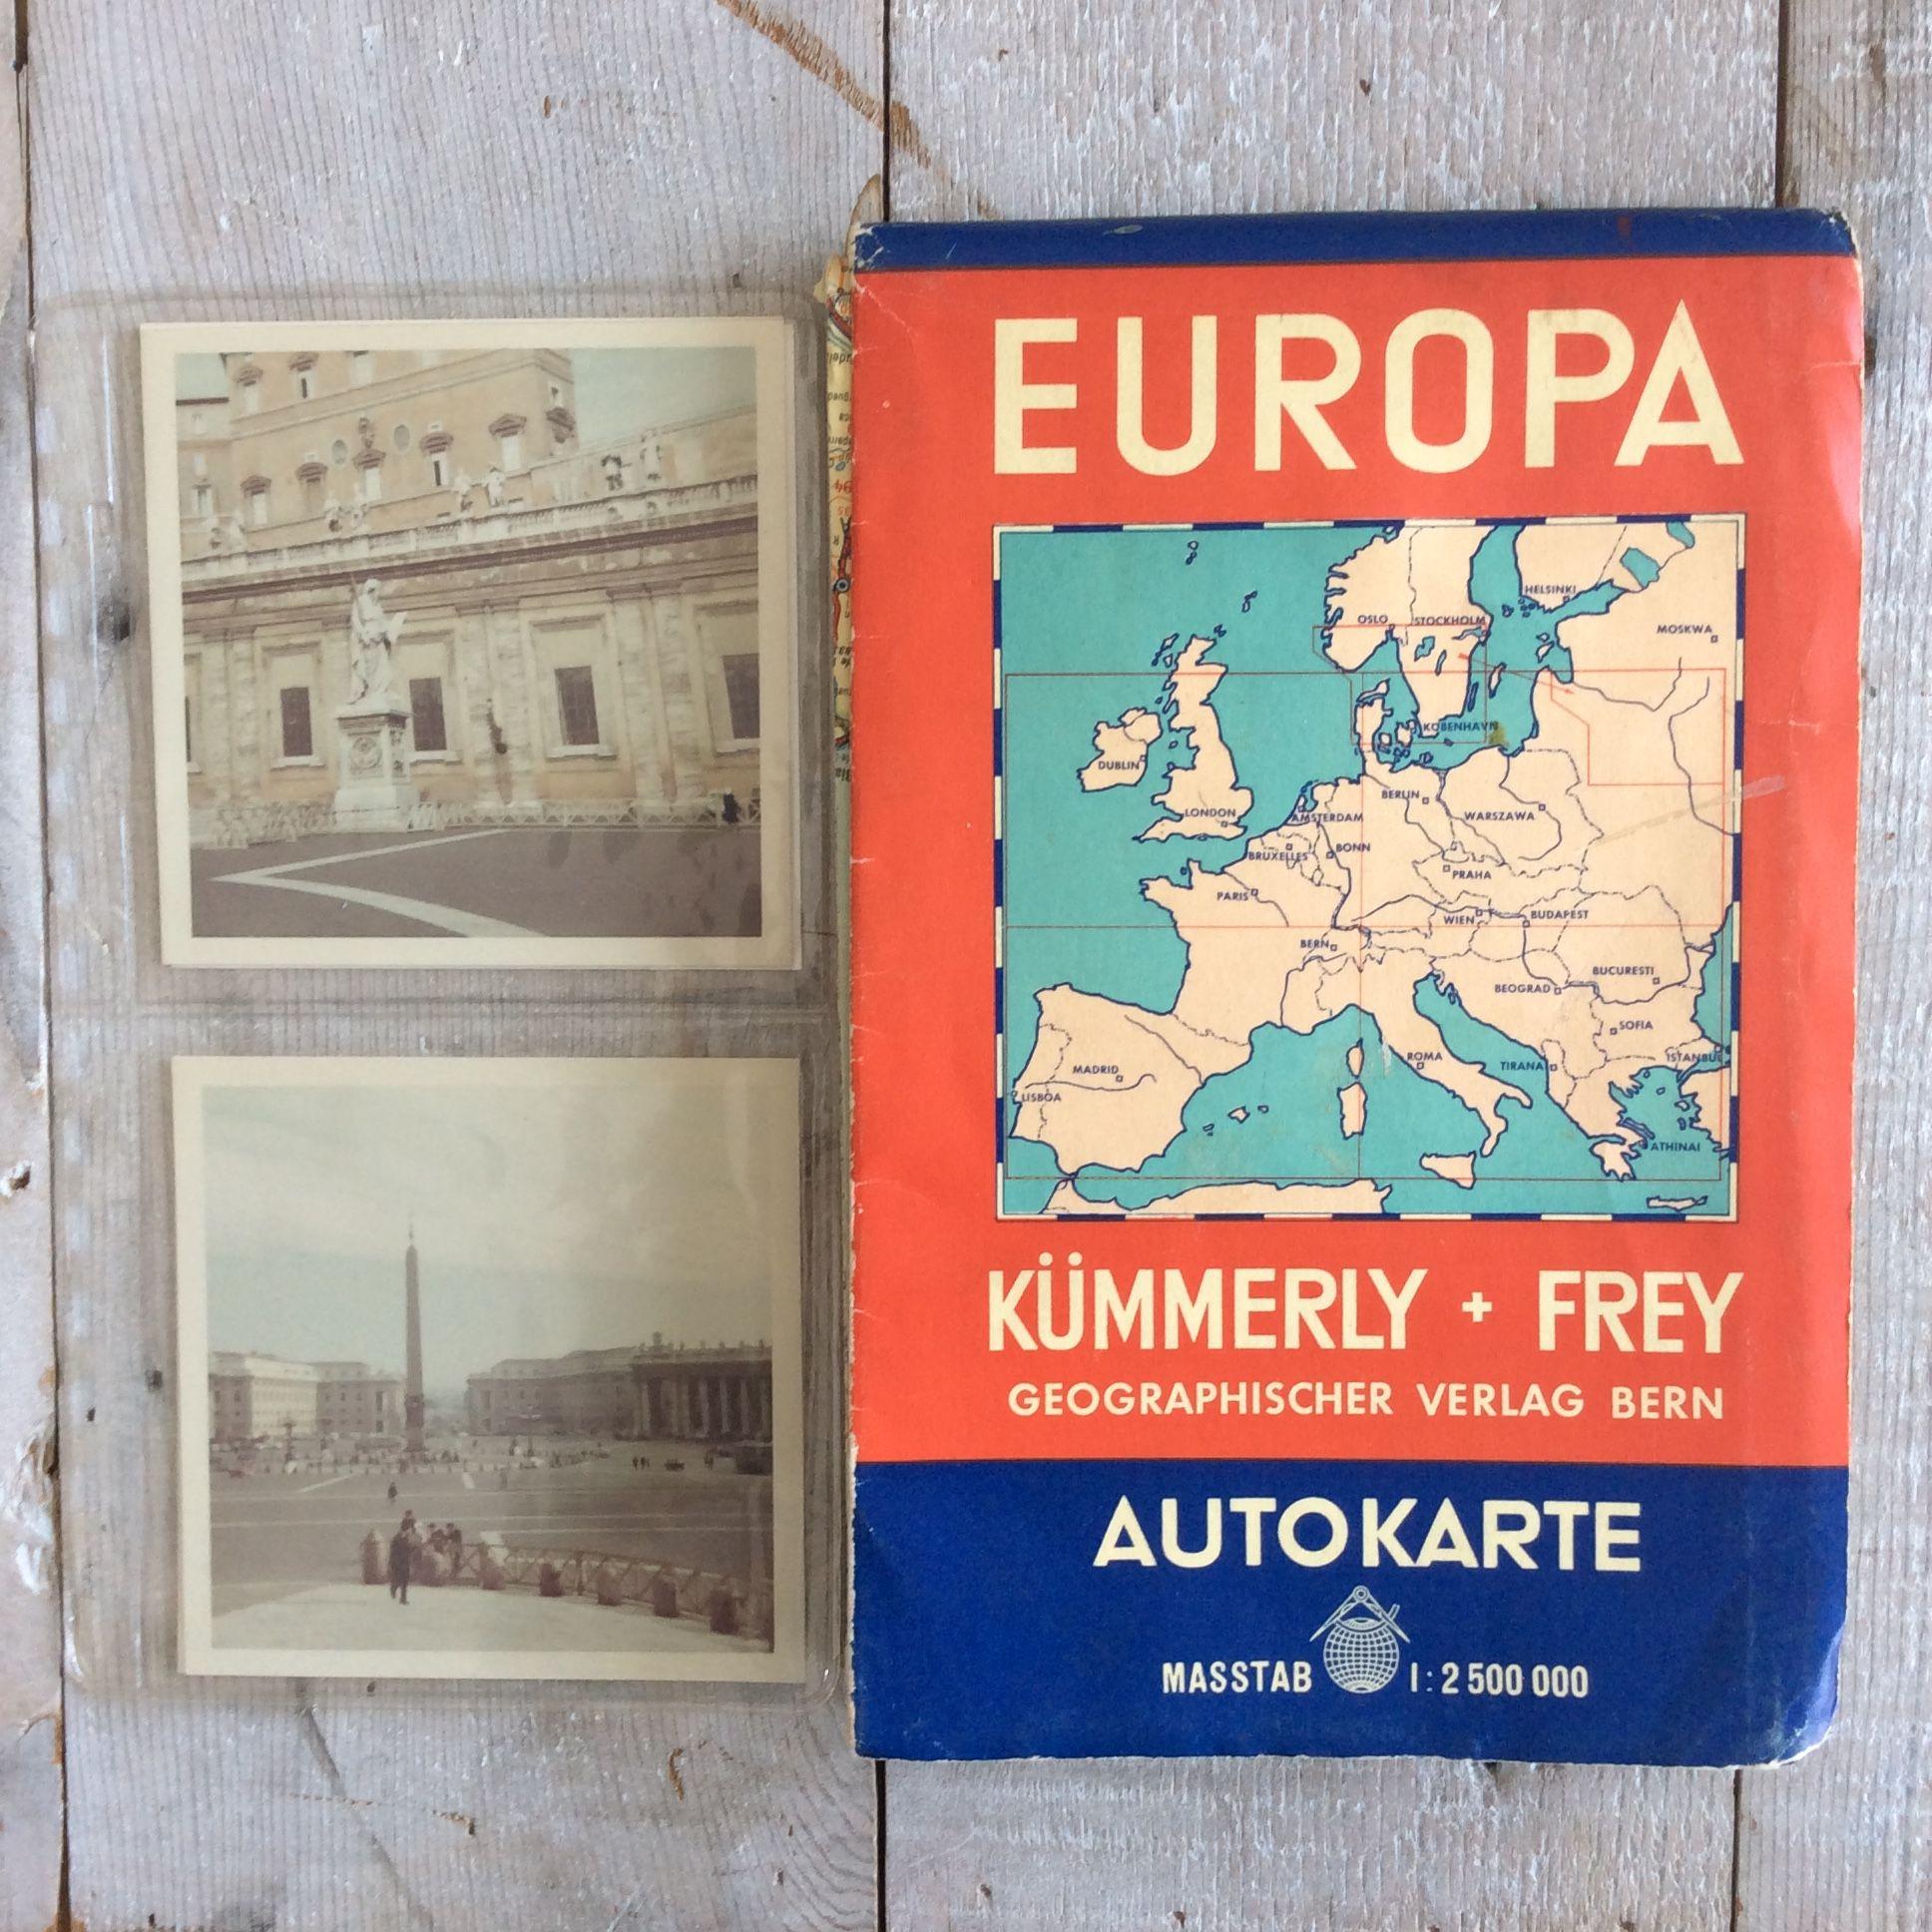 Vintage European vacay (With images) European vintage